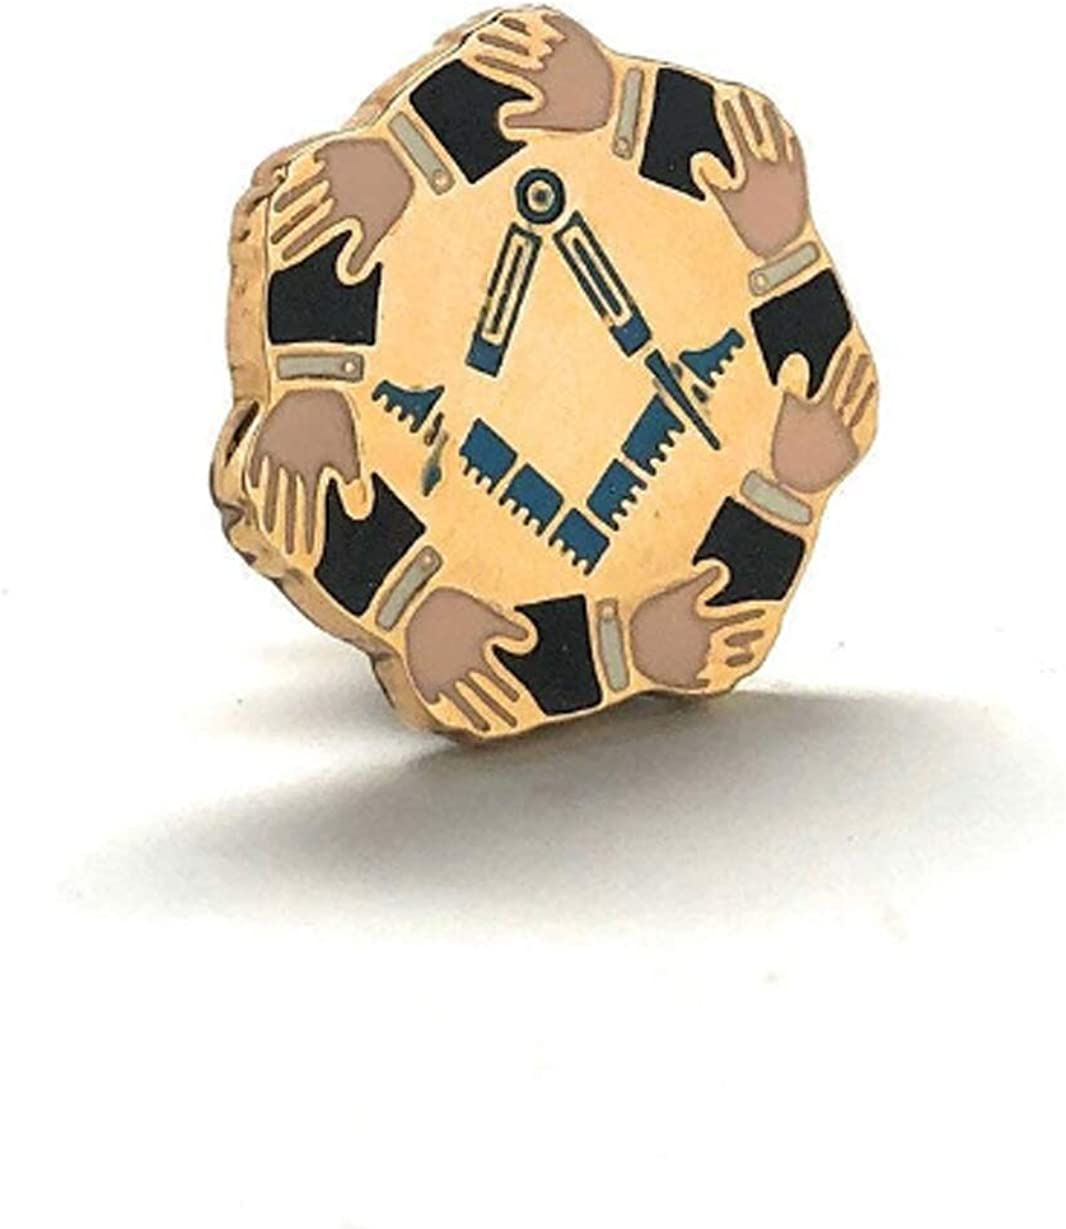 Enamel Pin Masonic Symbol Lapel Pin Freemason Mason Hands Gold Tone Compass and Square Tie Tack